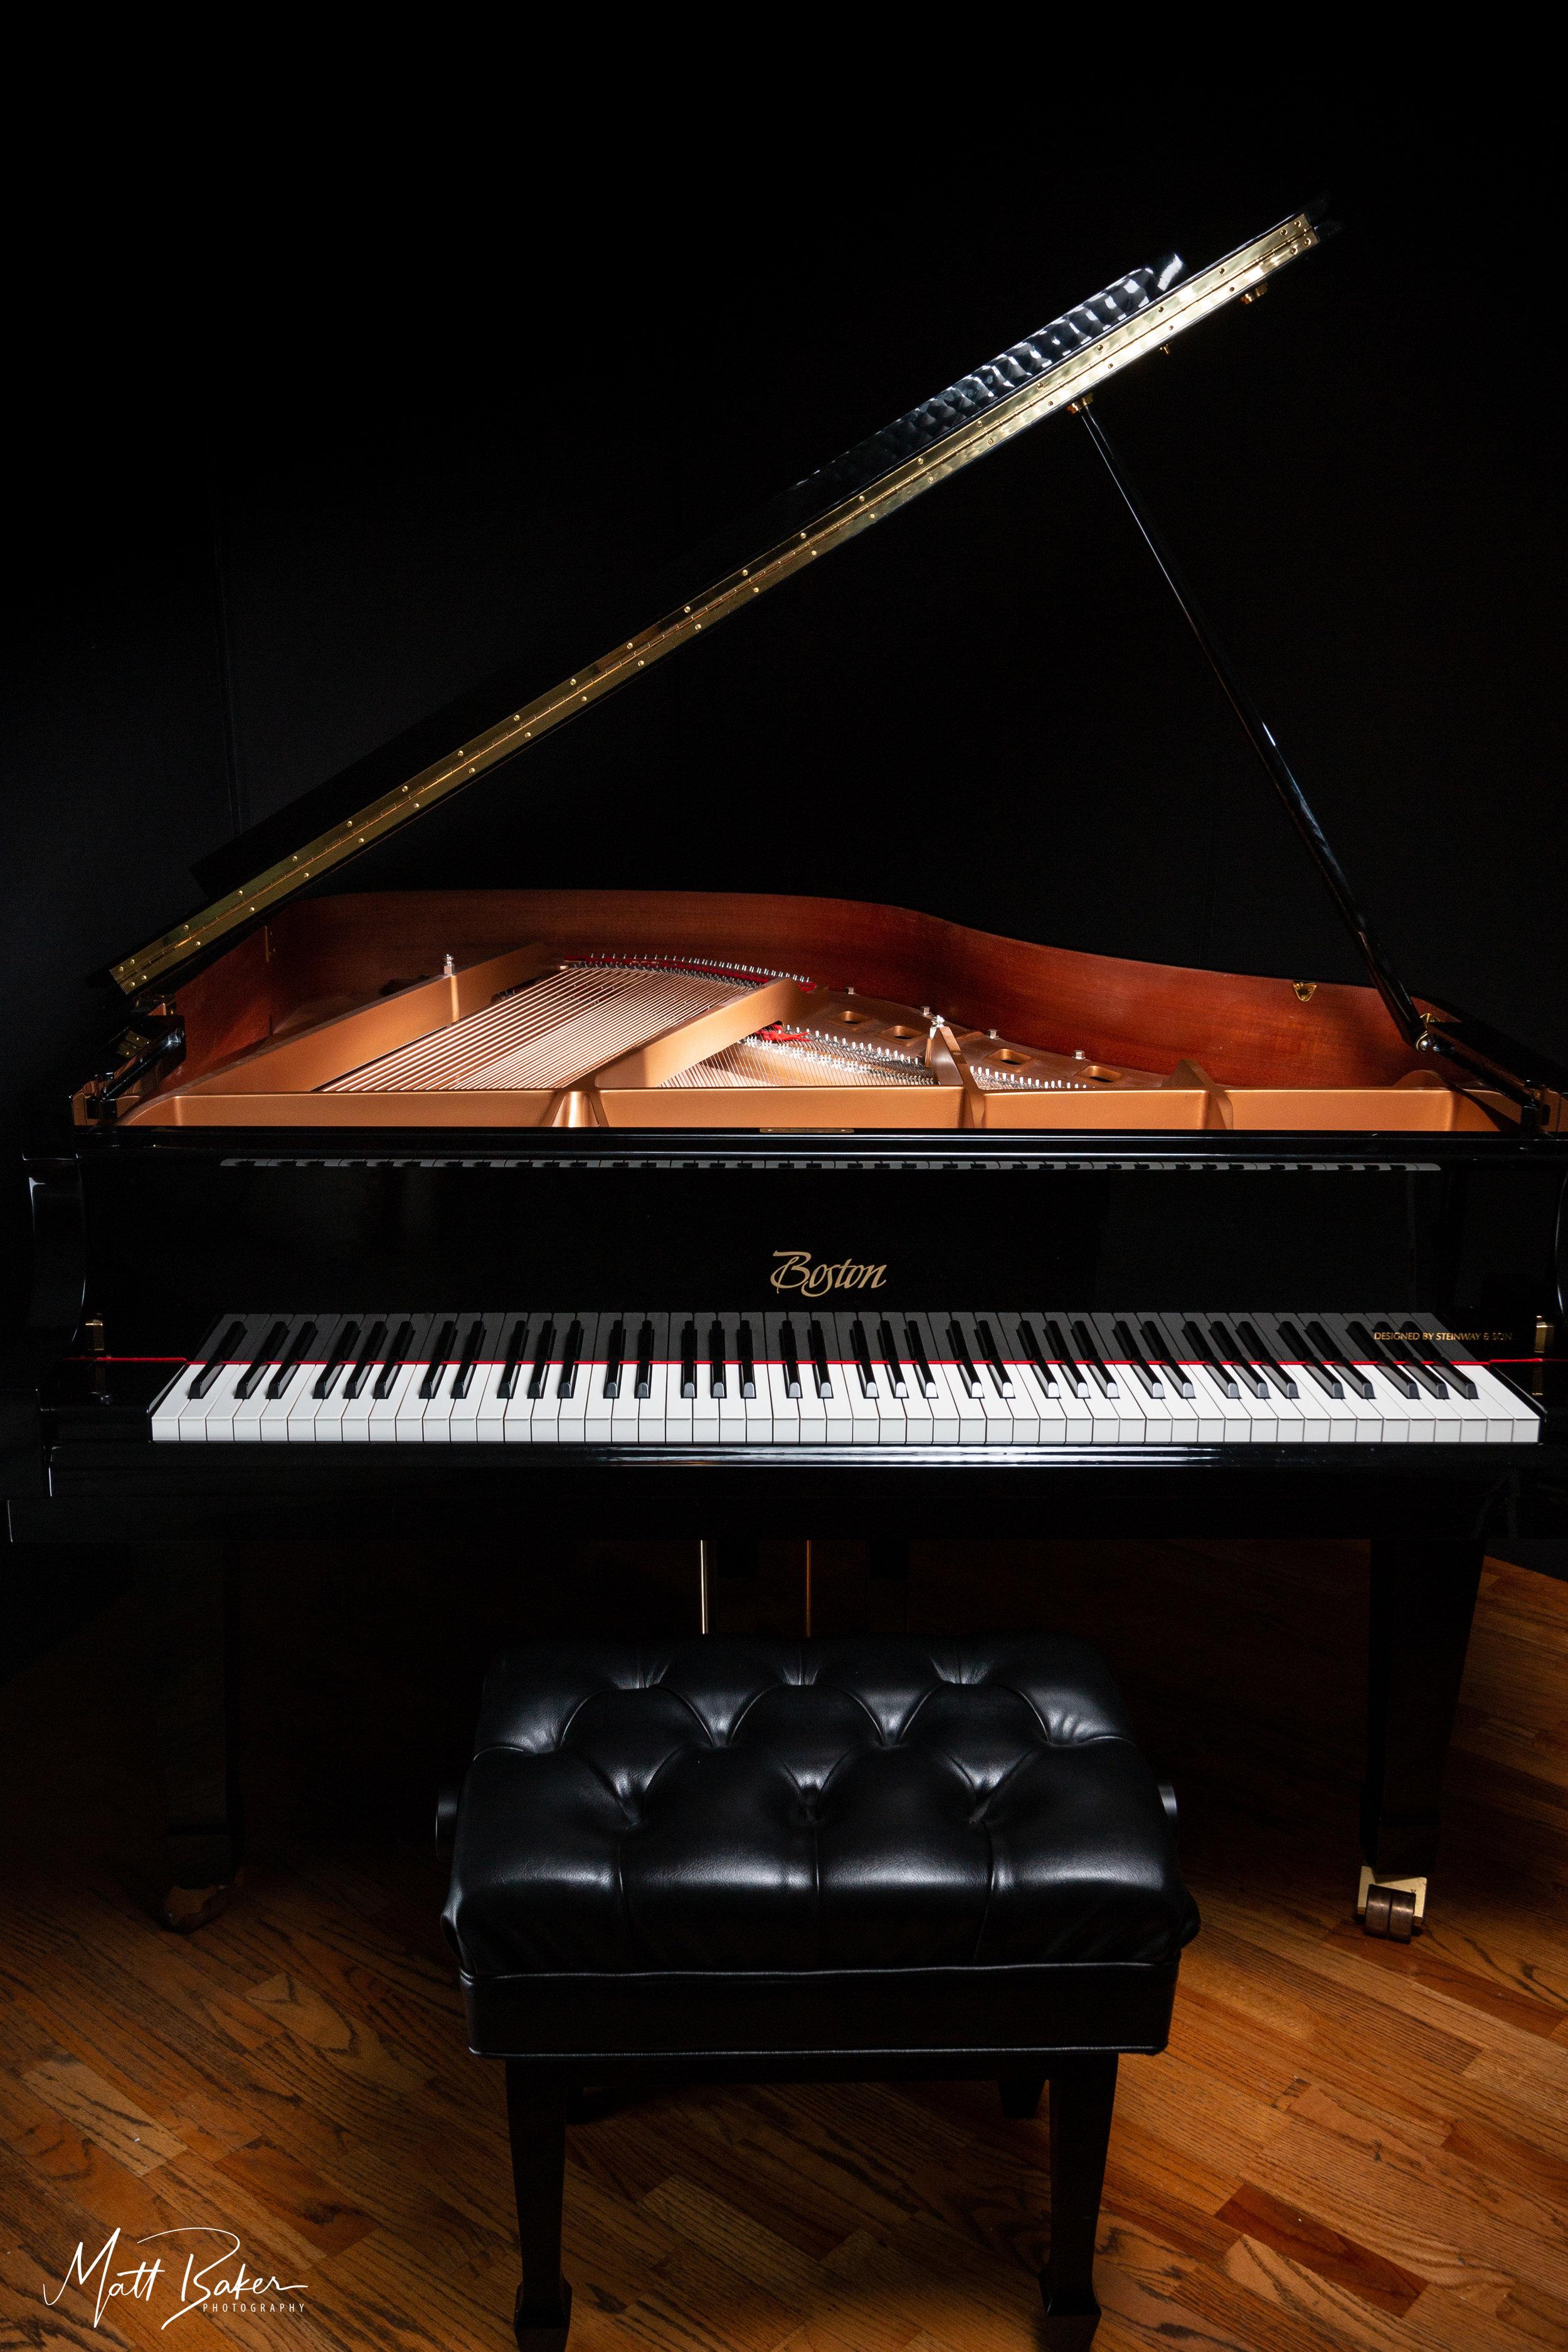 Piano in Studio_MG_5618.jpg